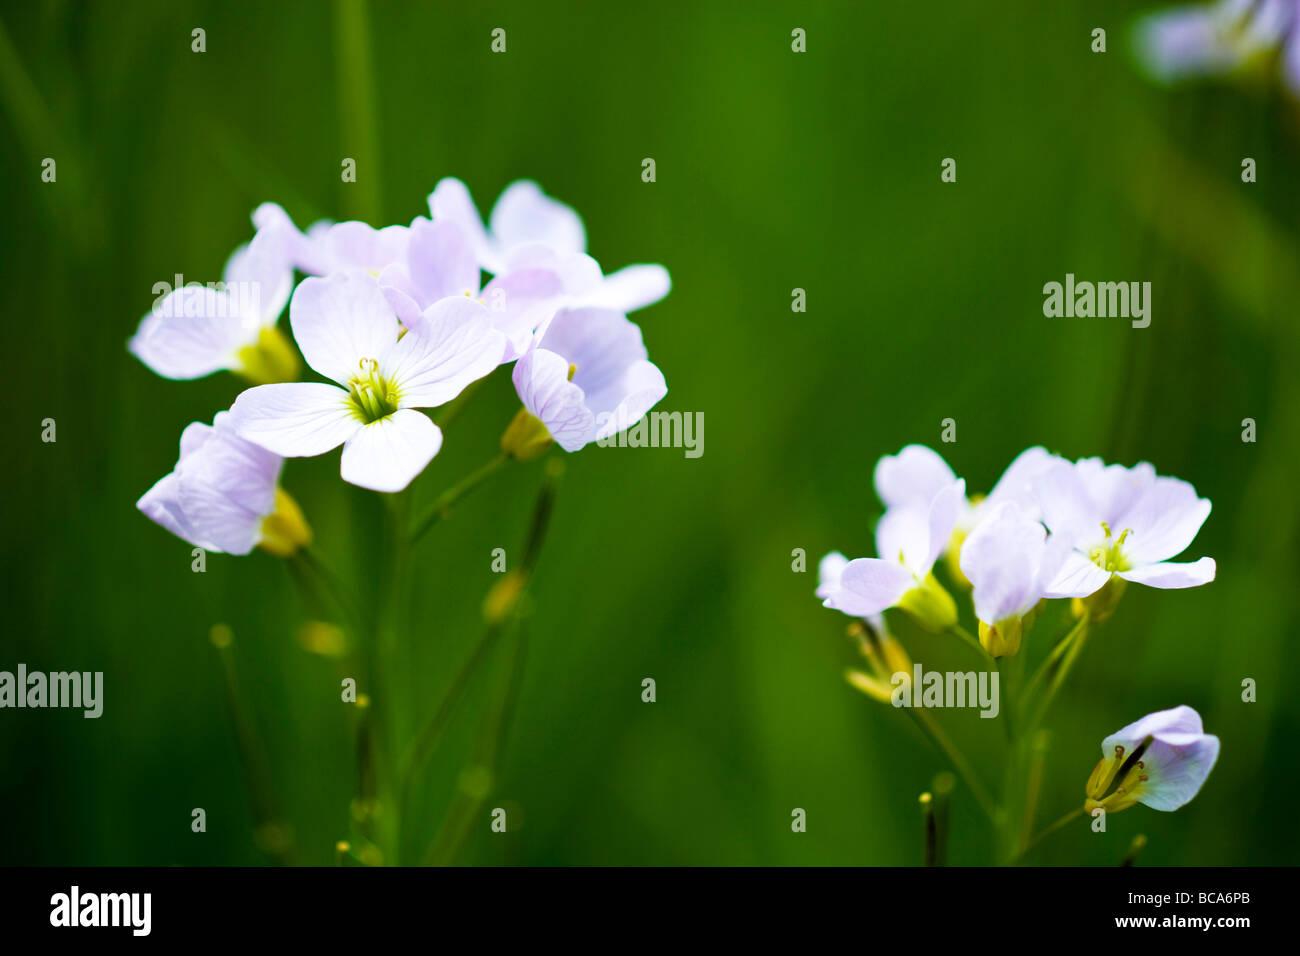 Mayflower or cuckoo flower Stock Photo